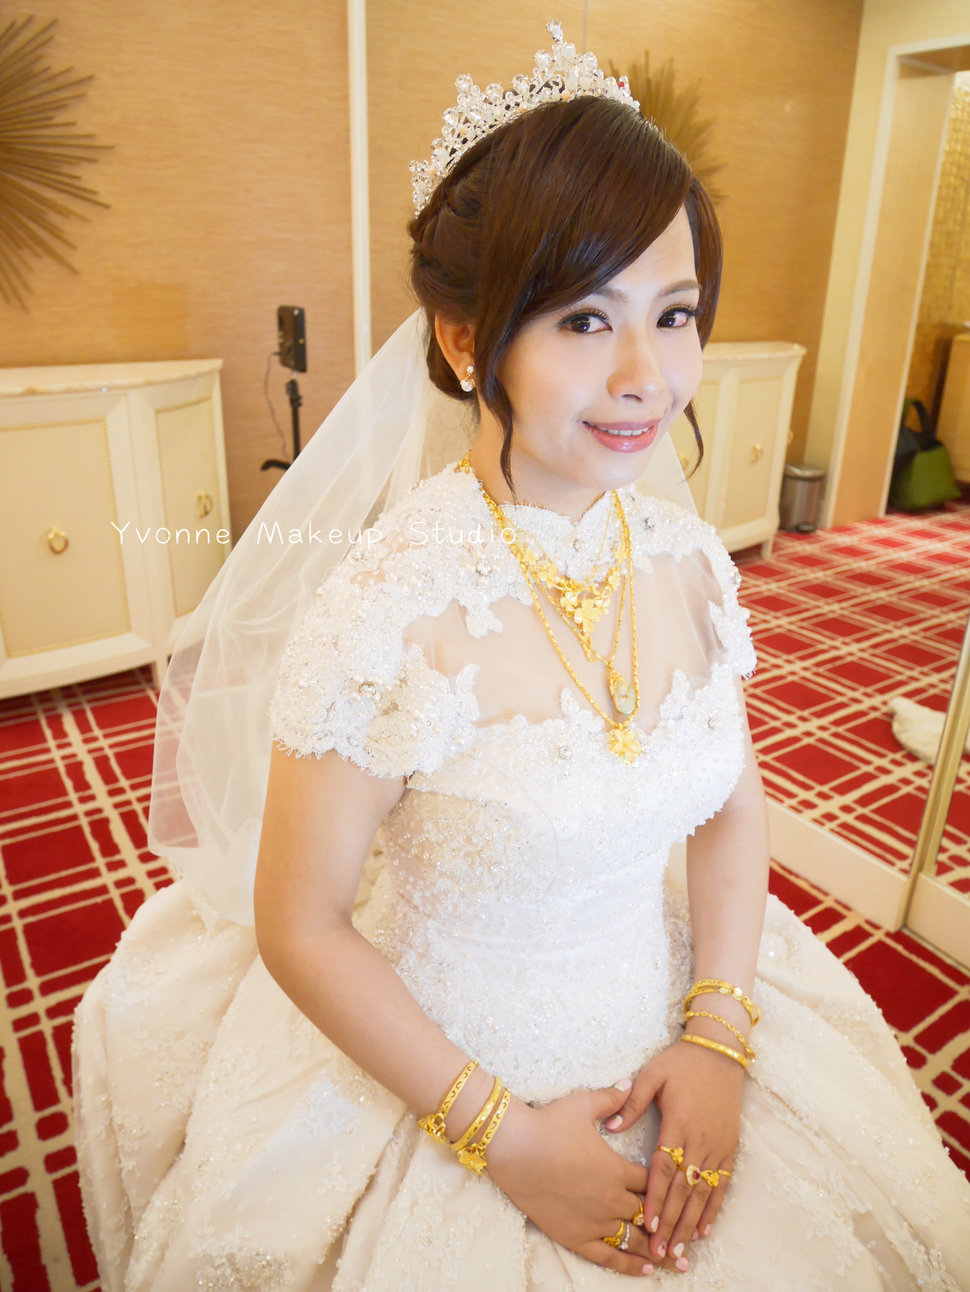 IMG_6675 - 做懂妳的新秘 Yvonne 嘉云《結婚吧》